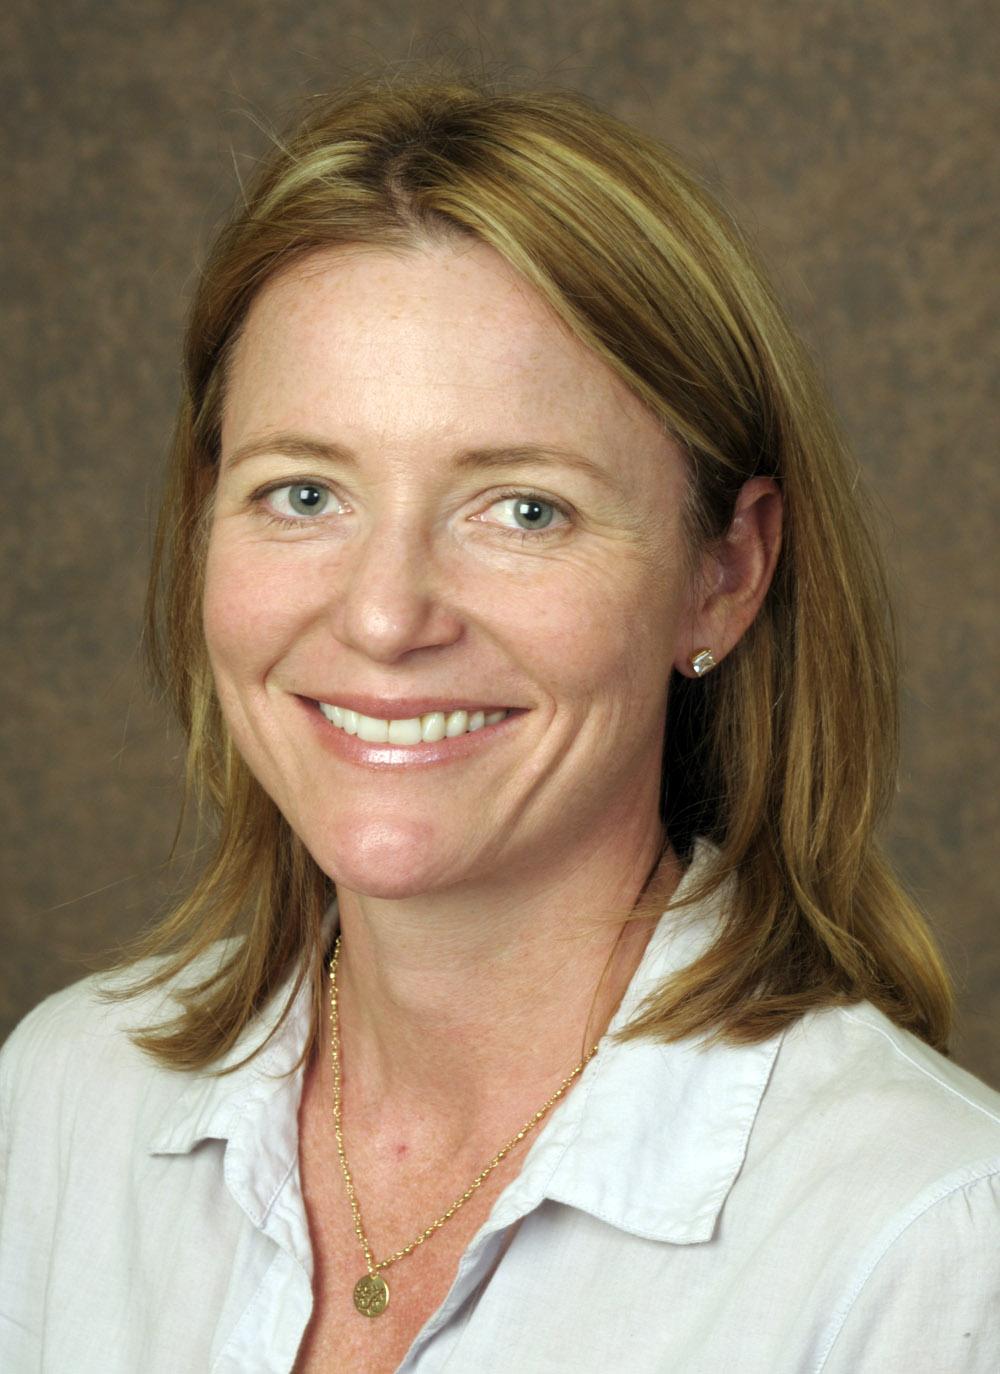 Michelle Pashley, DDS, 2001-2005